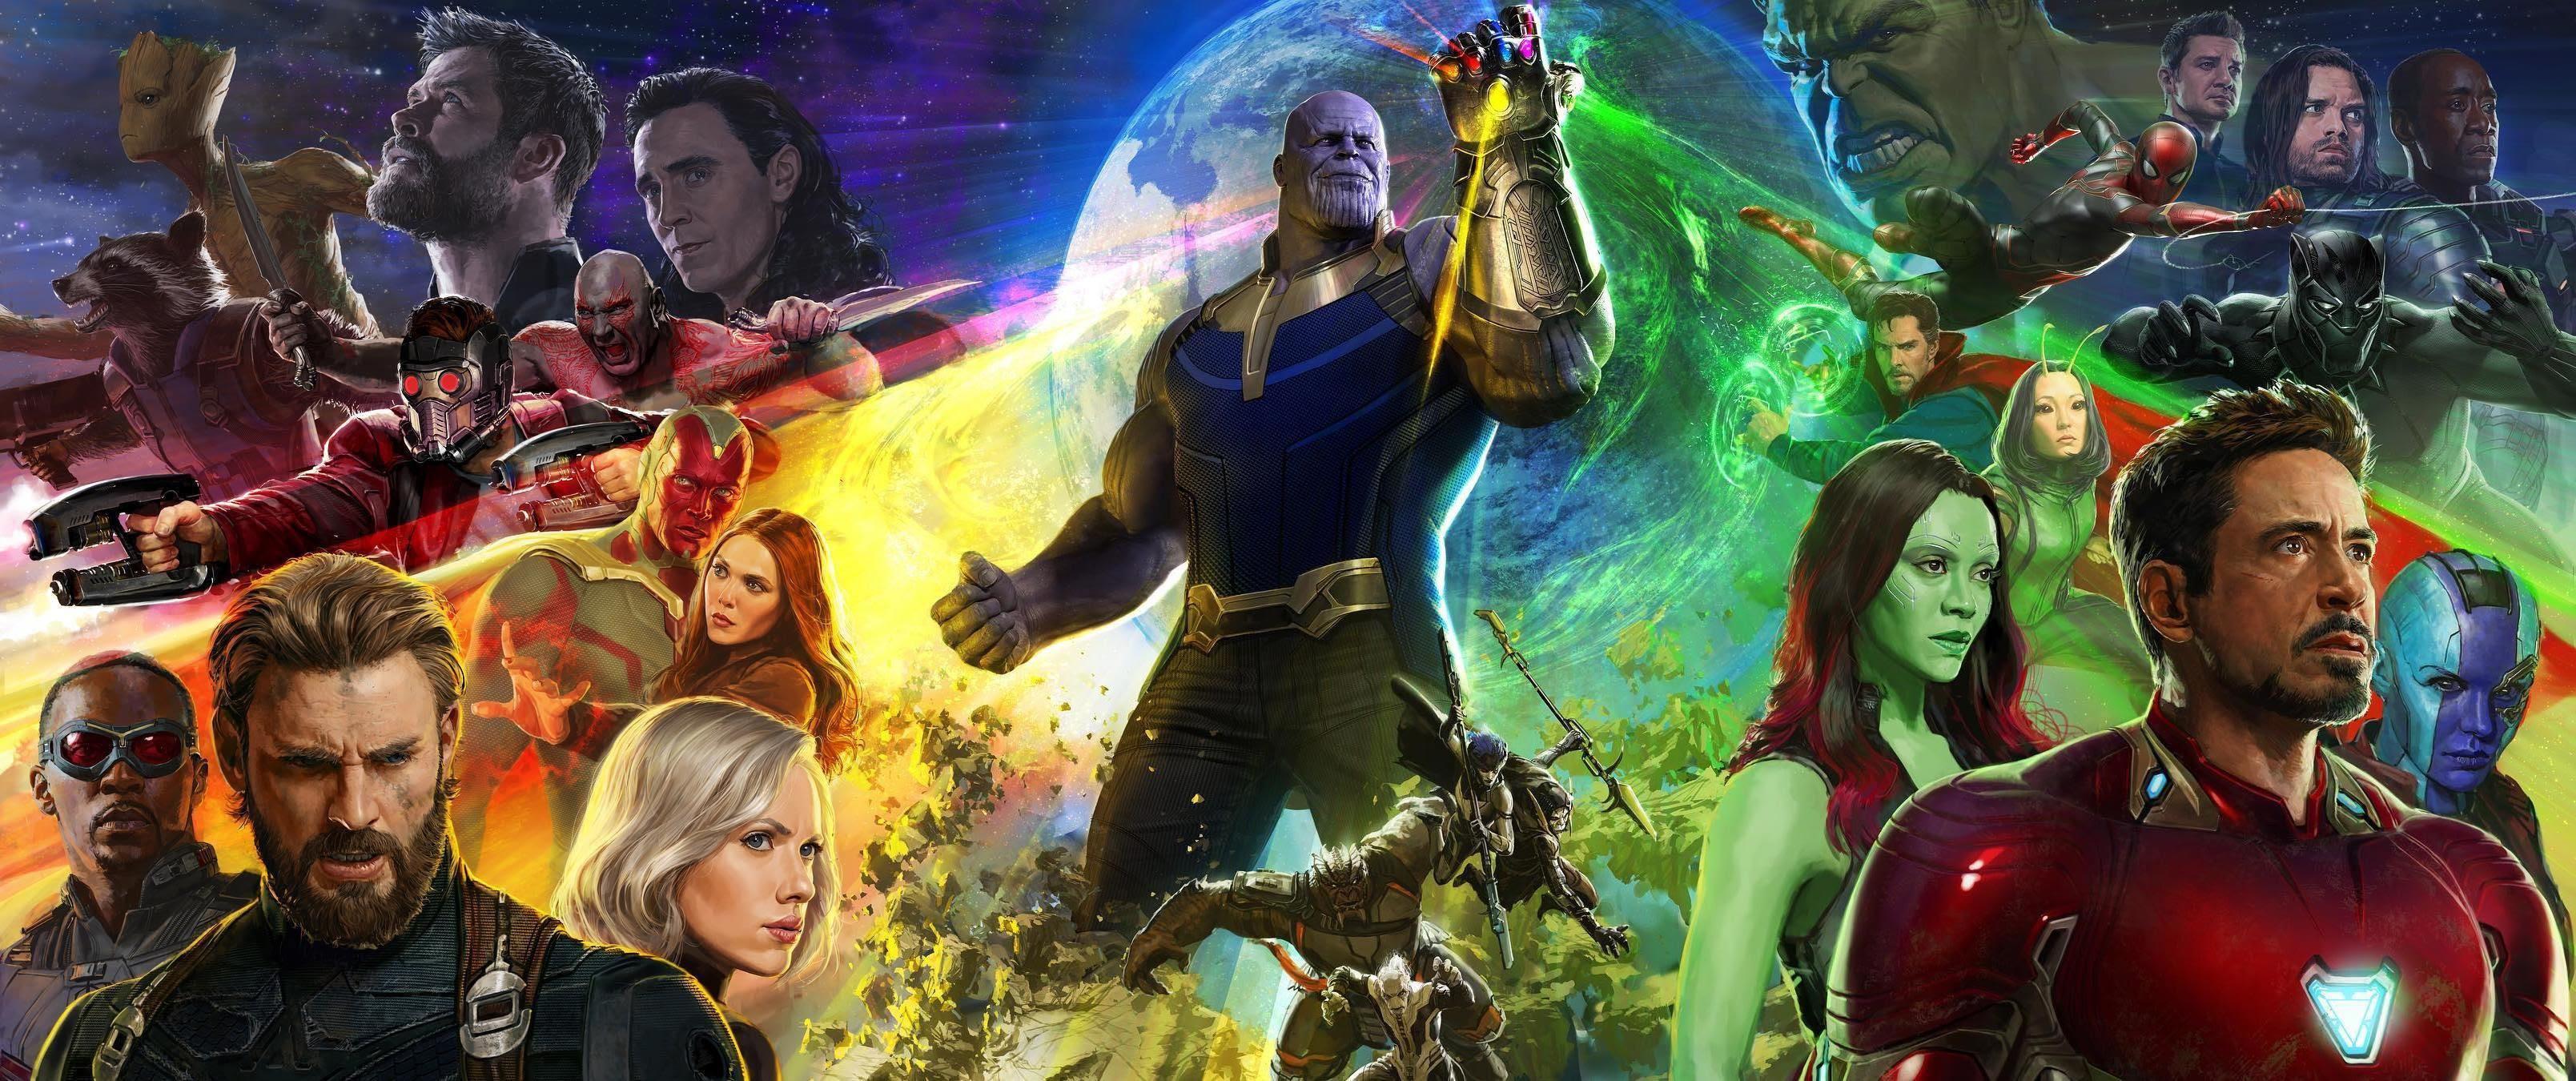 Resultado de imagen para avengers infinity war poster